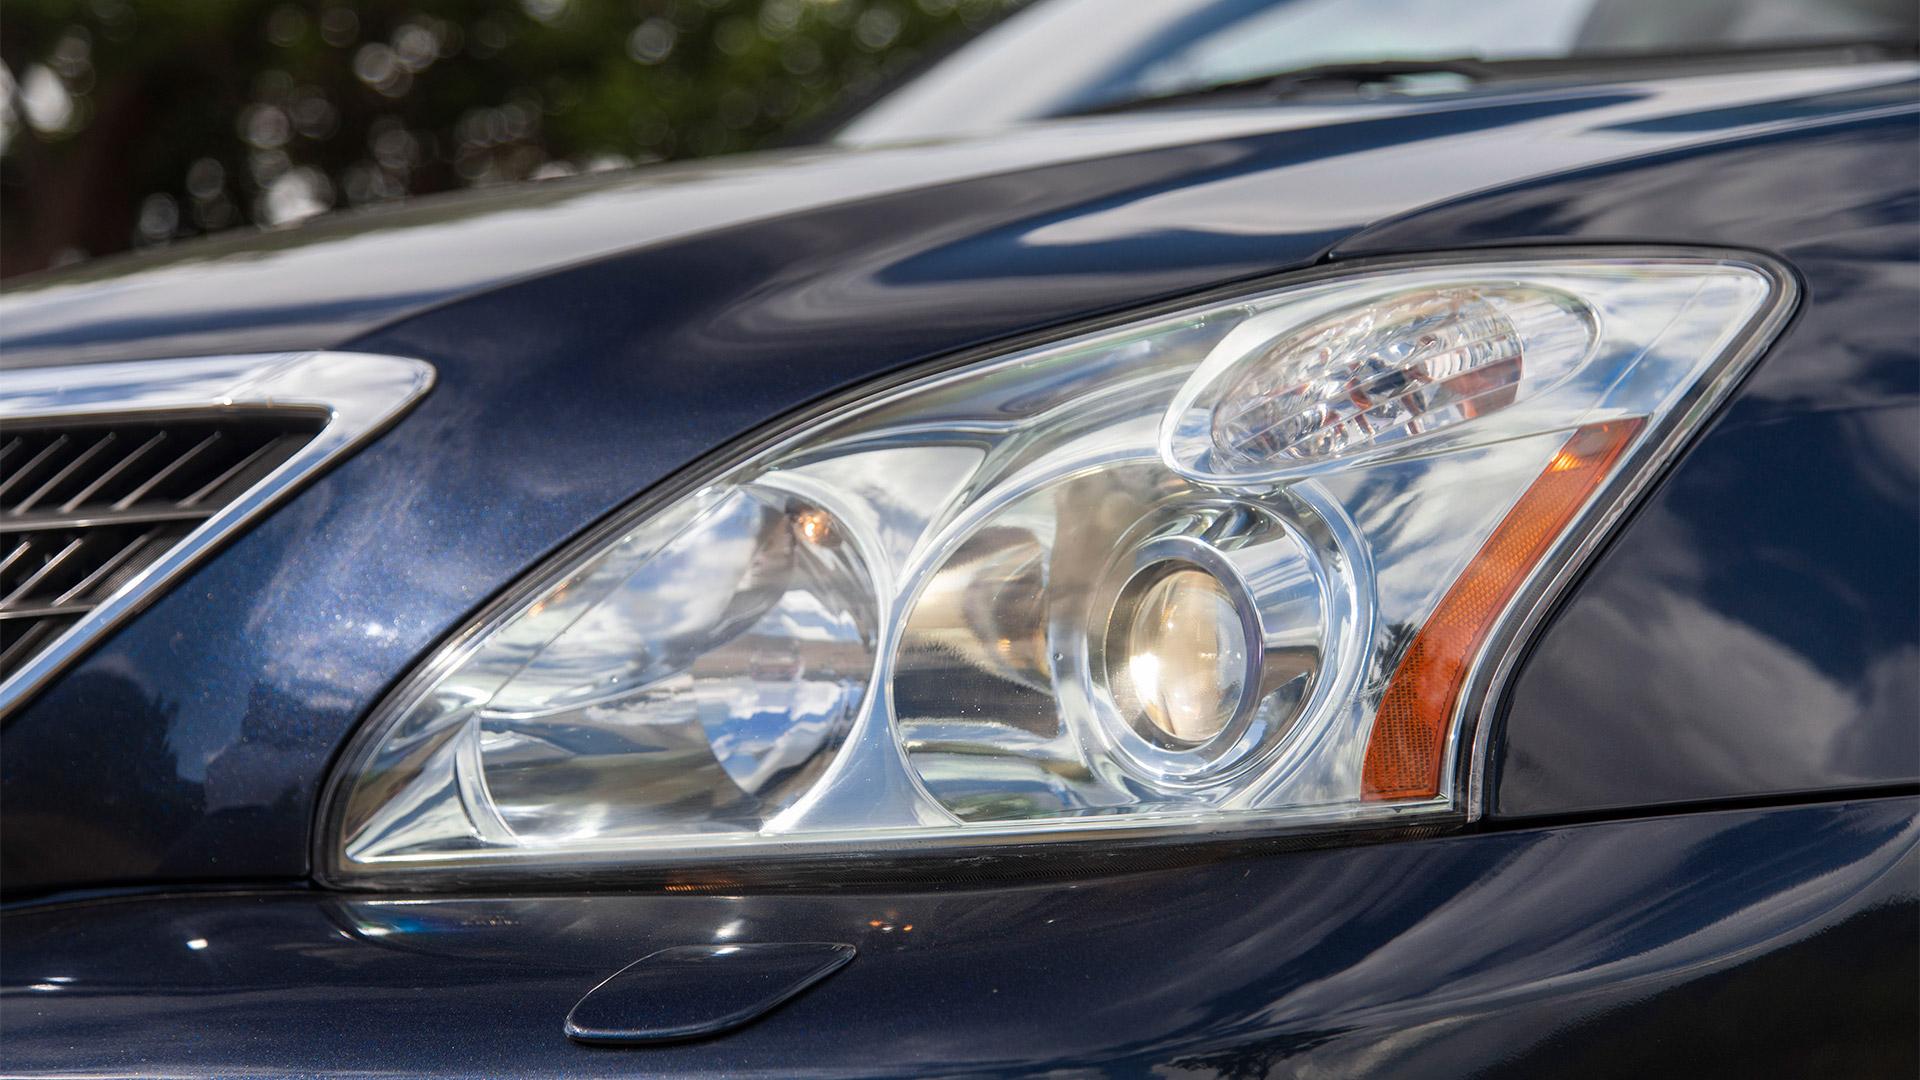 13 2019 020 Lexus RX pionier 1920x1080 galerij